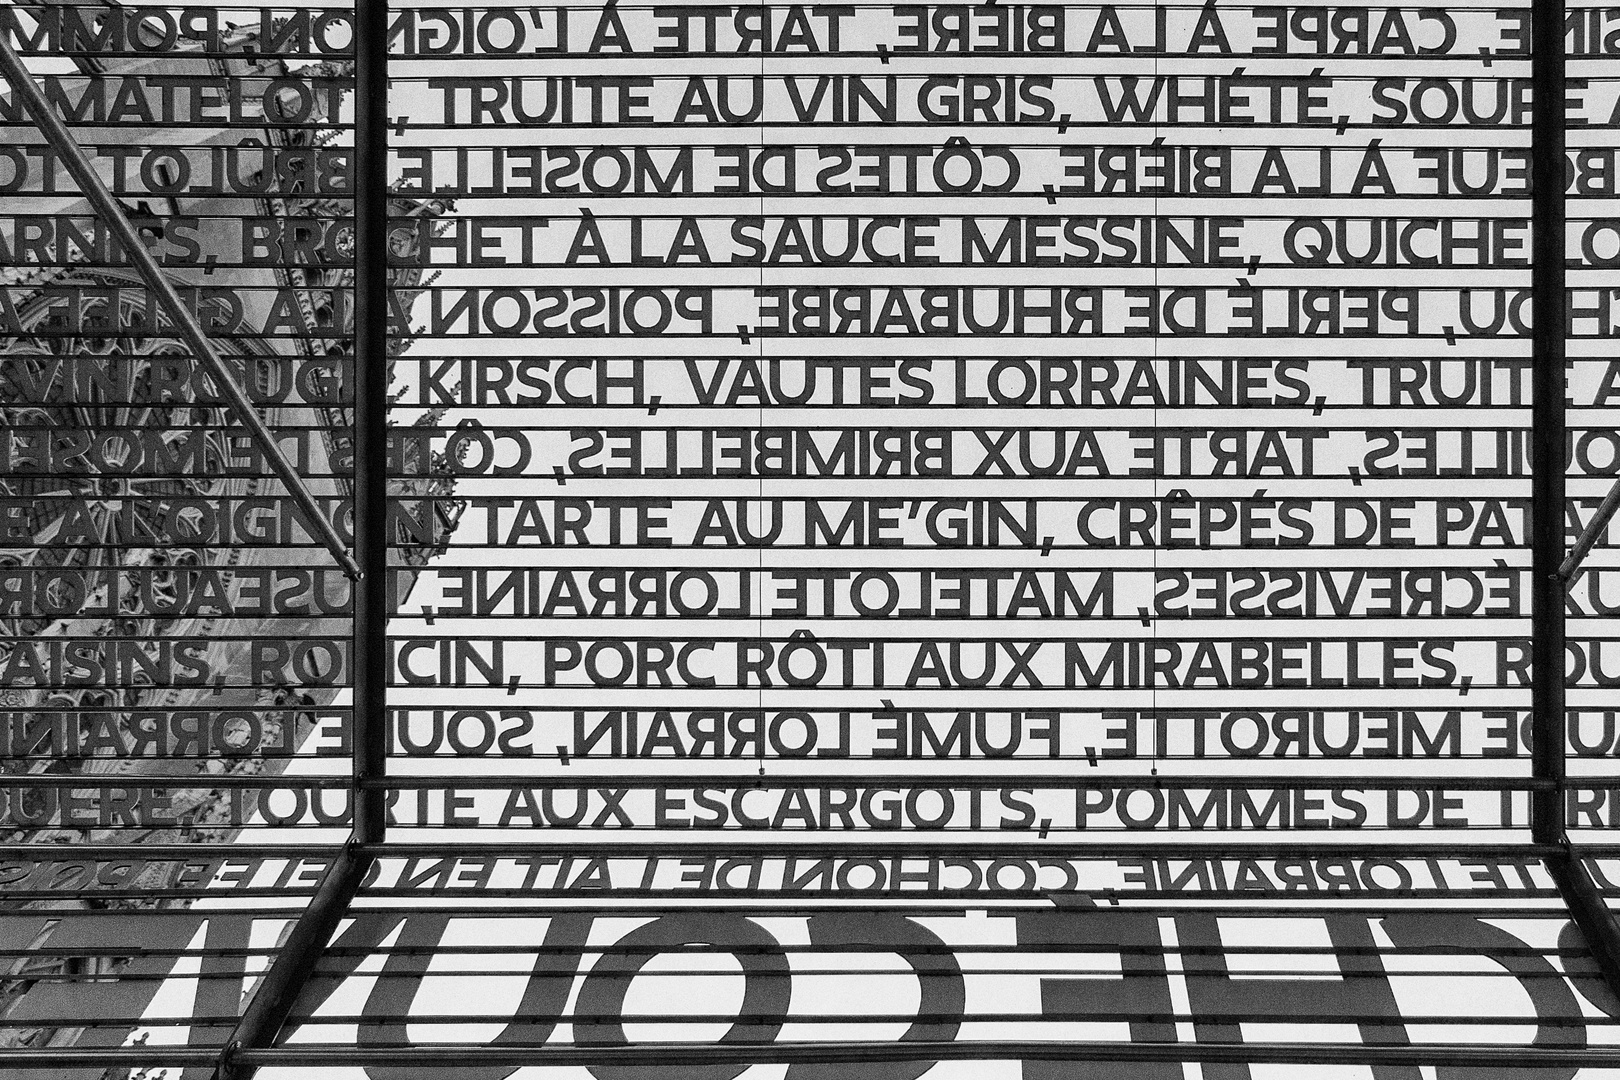 Marché Couvert Metz